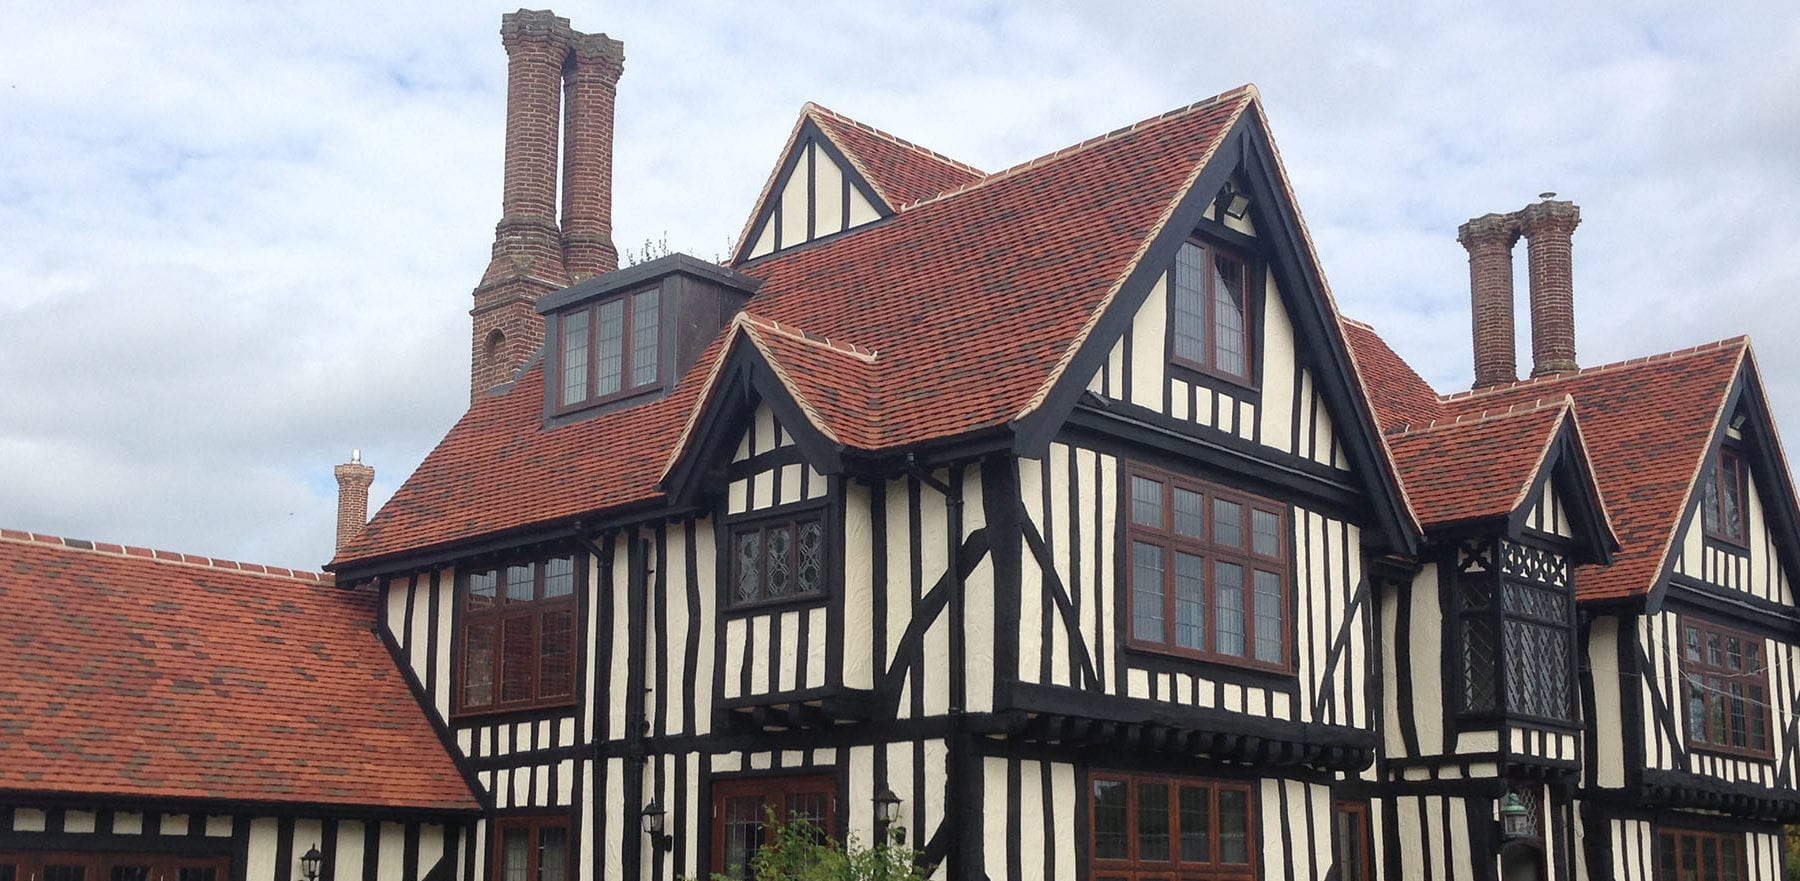 Lifestiles - Handmade Bespoke Clay Roof Tiles - Tudor Park, England 3